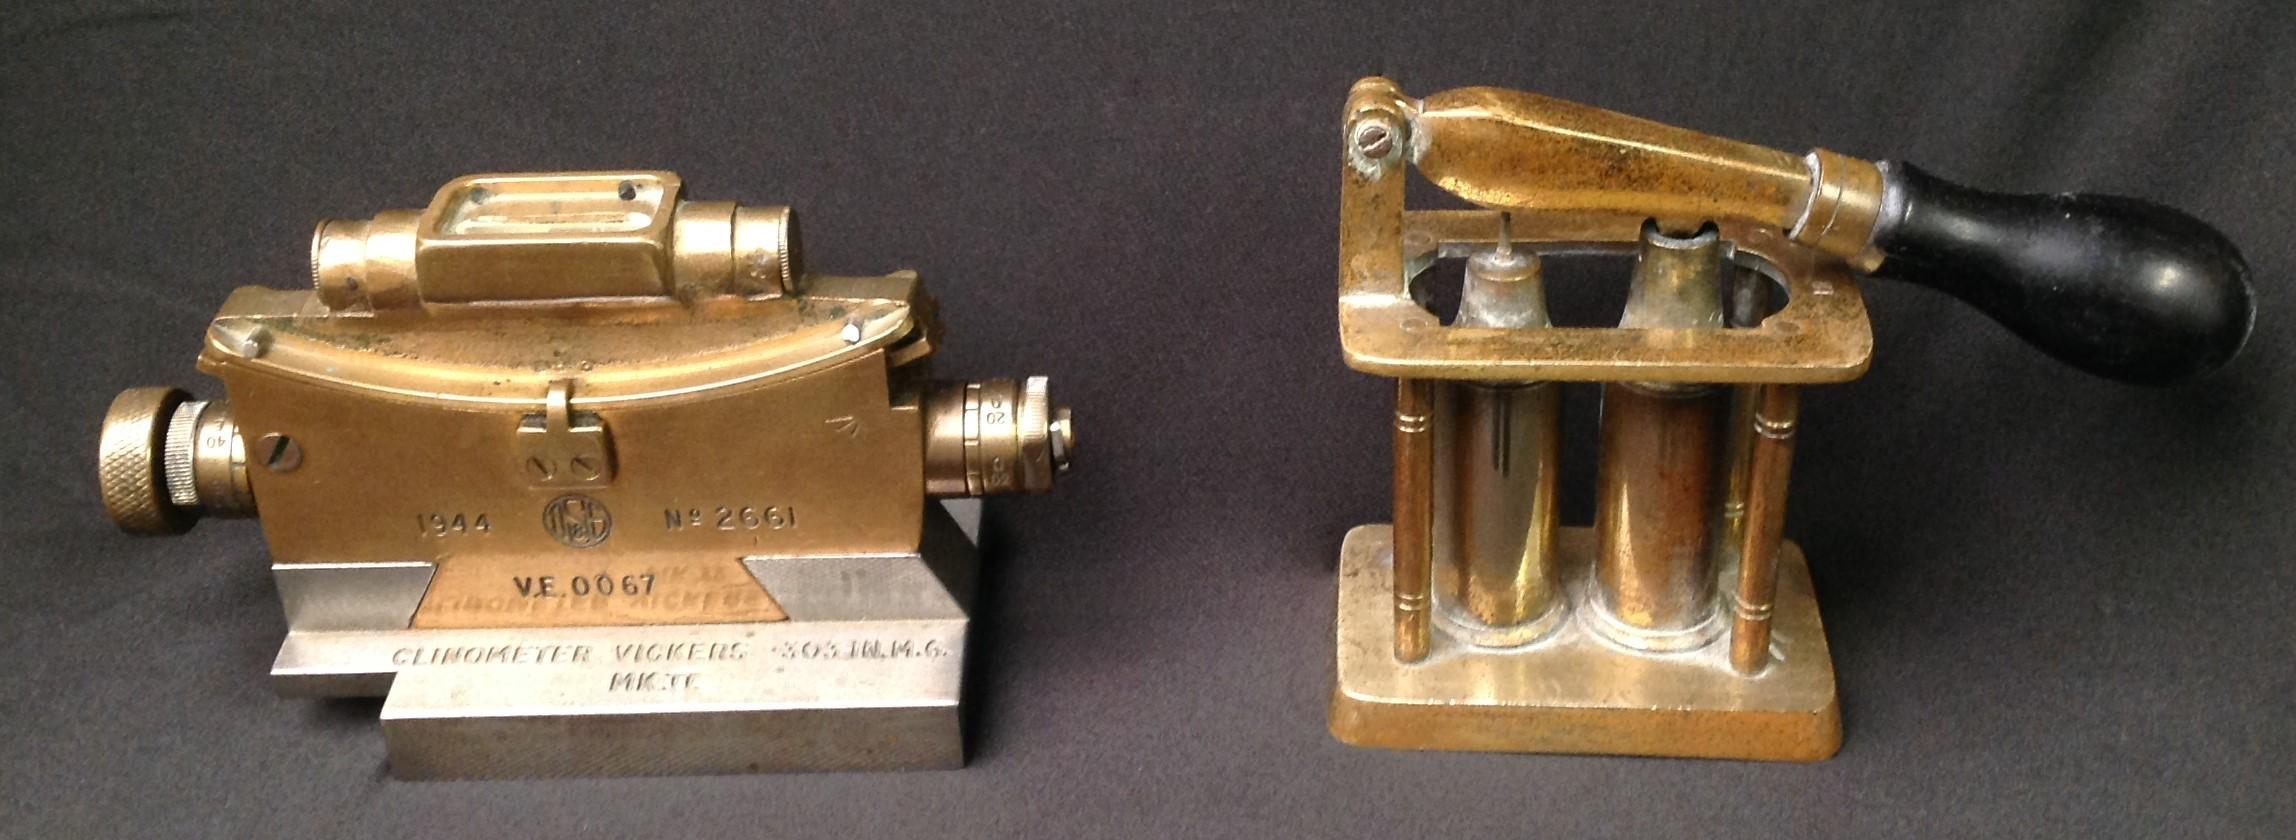 WW2 British Clinometer Vickers .303in MG MKII dated 1944 and a brass 12 Bore Shotgun primer